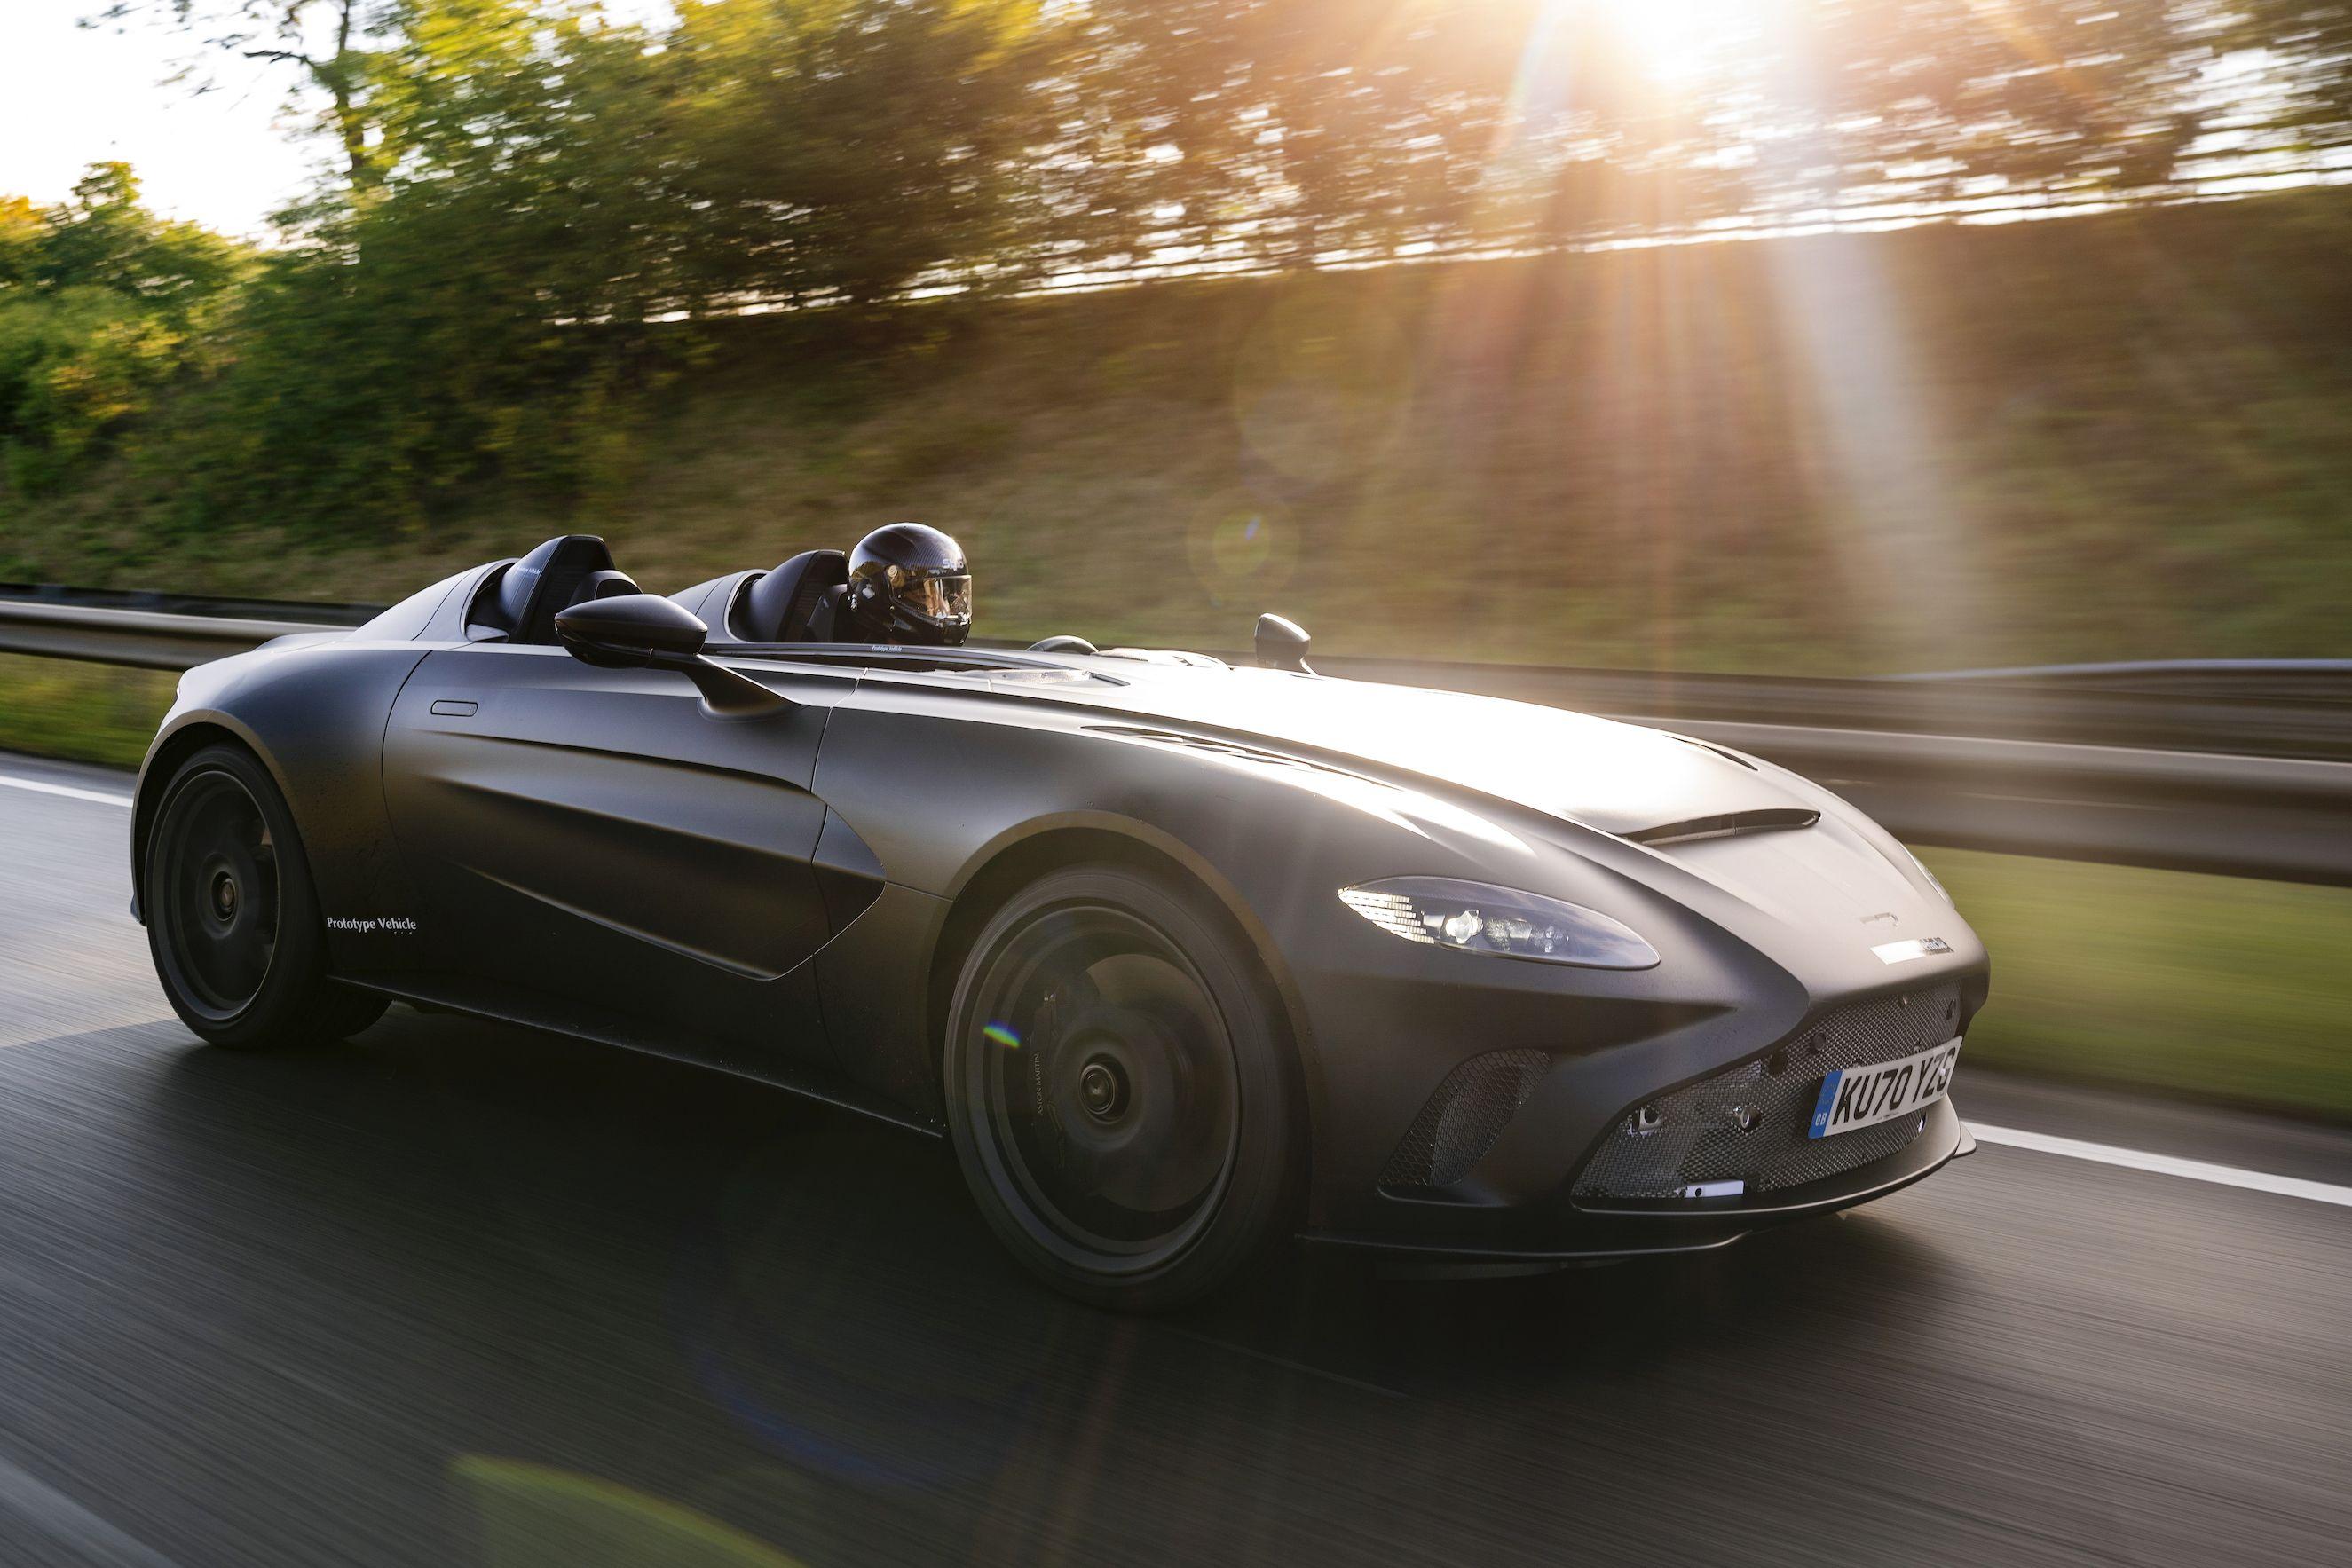 Aston Martin Reveals Photos Of V12 Speedster Prototype On The Road